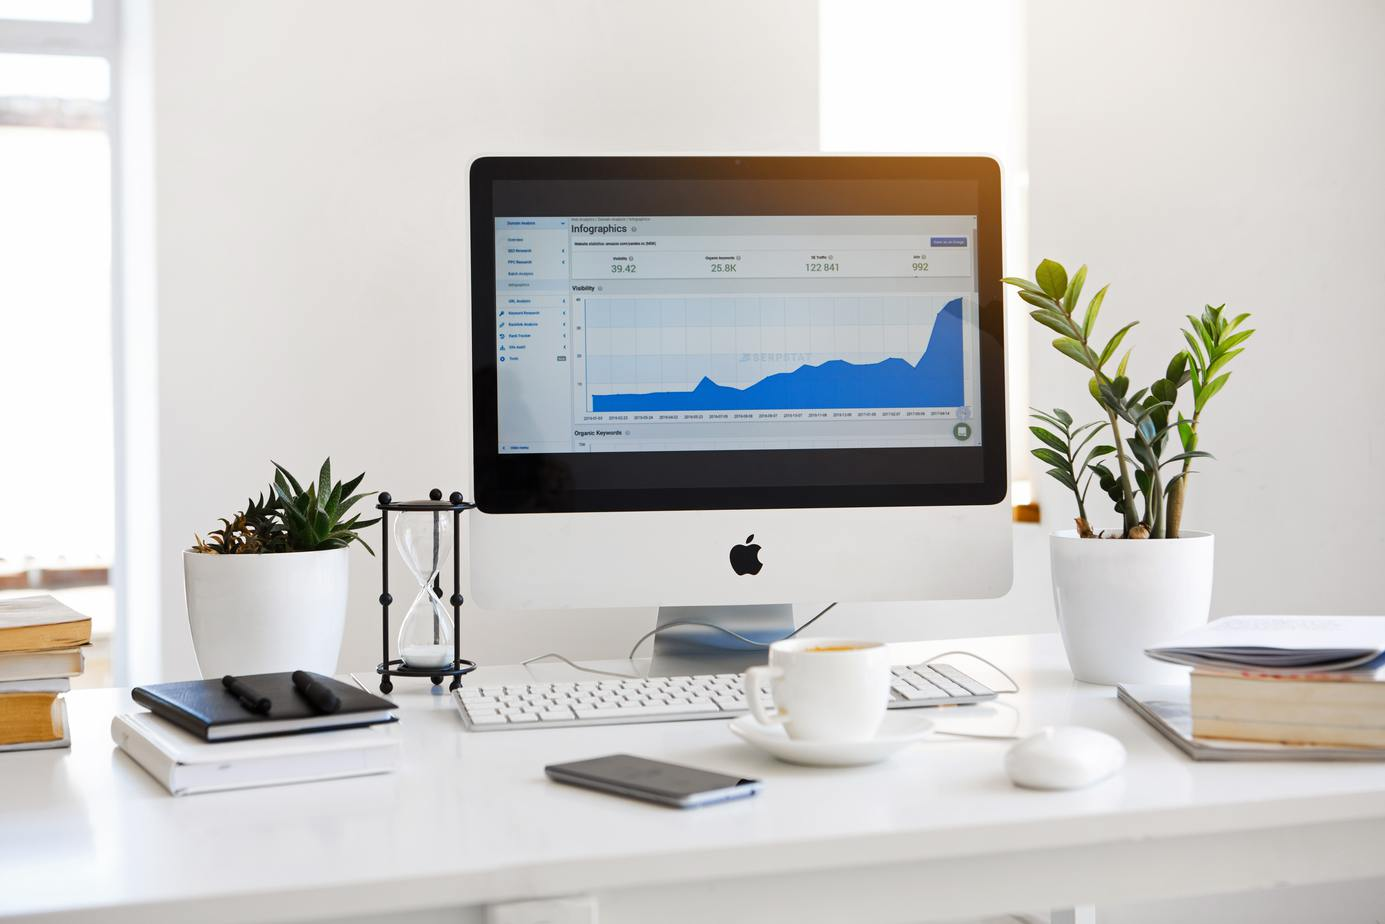 Tools - Produktivität - Empfehlung - Tipp